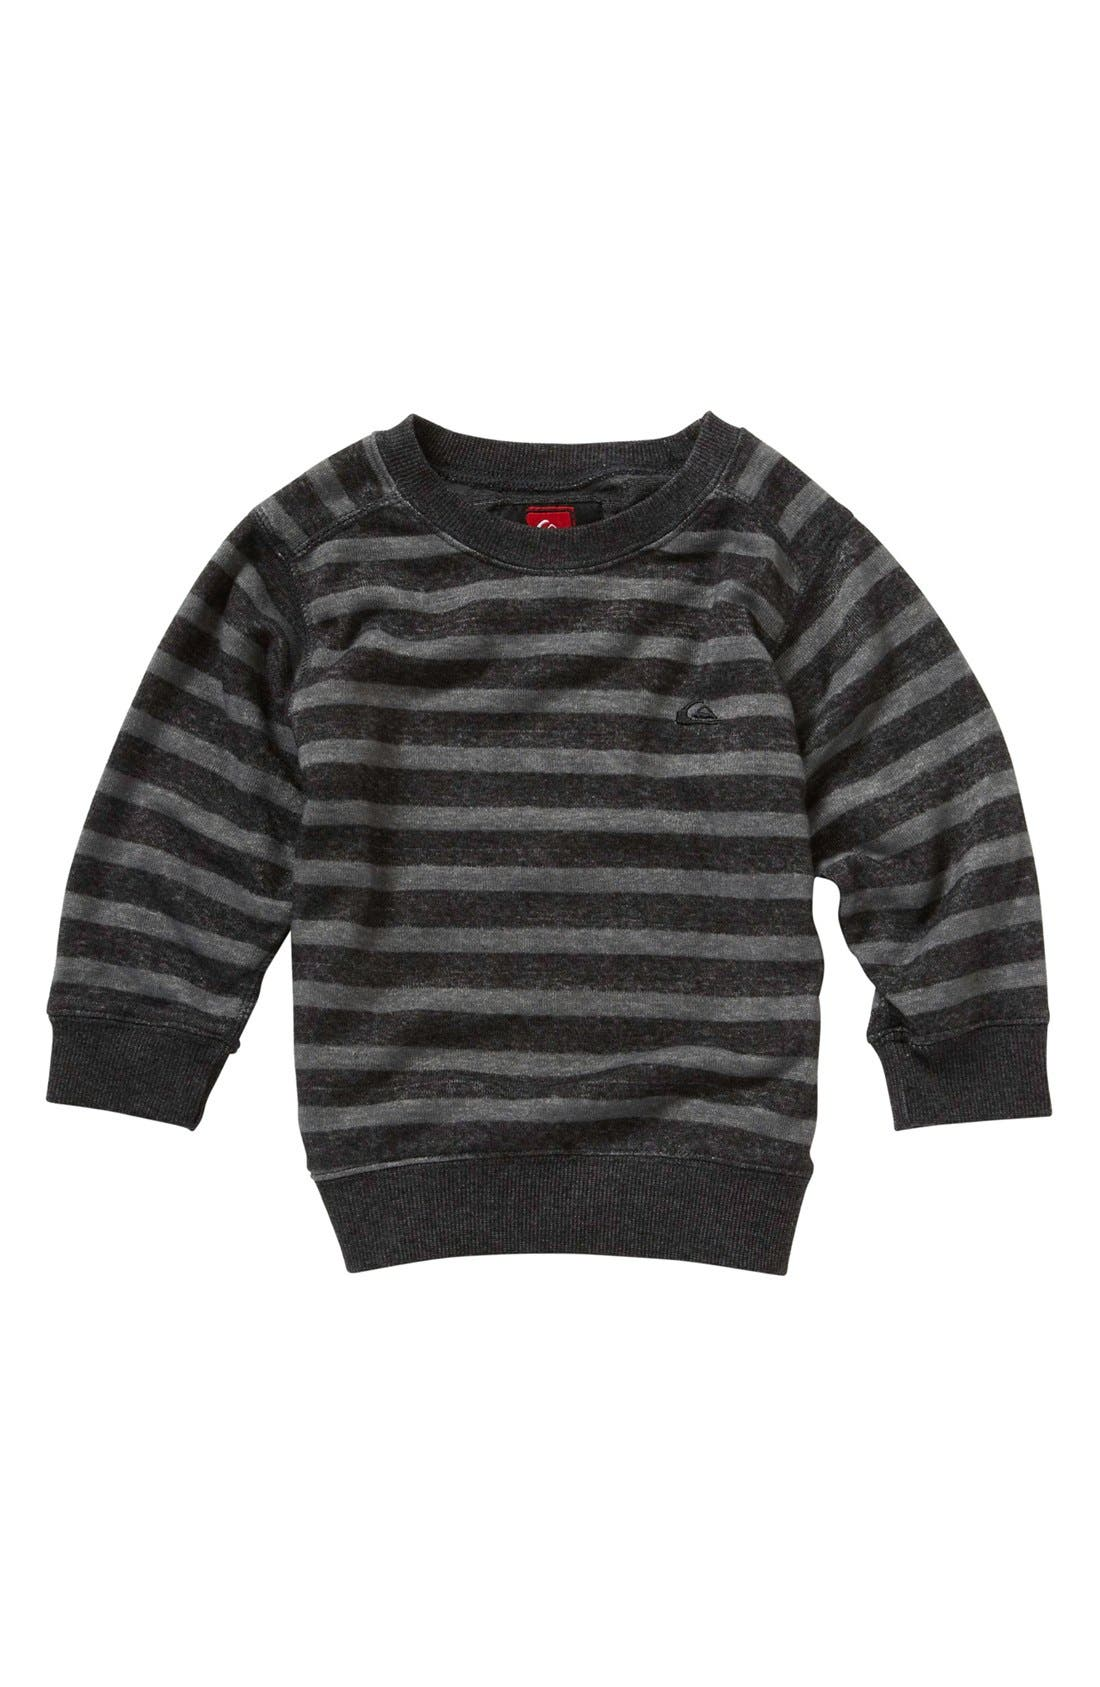 Alternate Image 1 Selected - Quiksilver 'Spiff Tiff' Sweatshirt (Baby Boys)